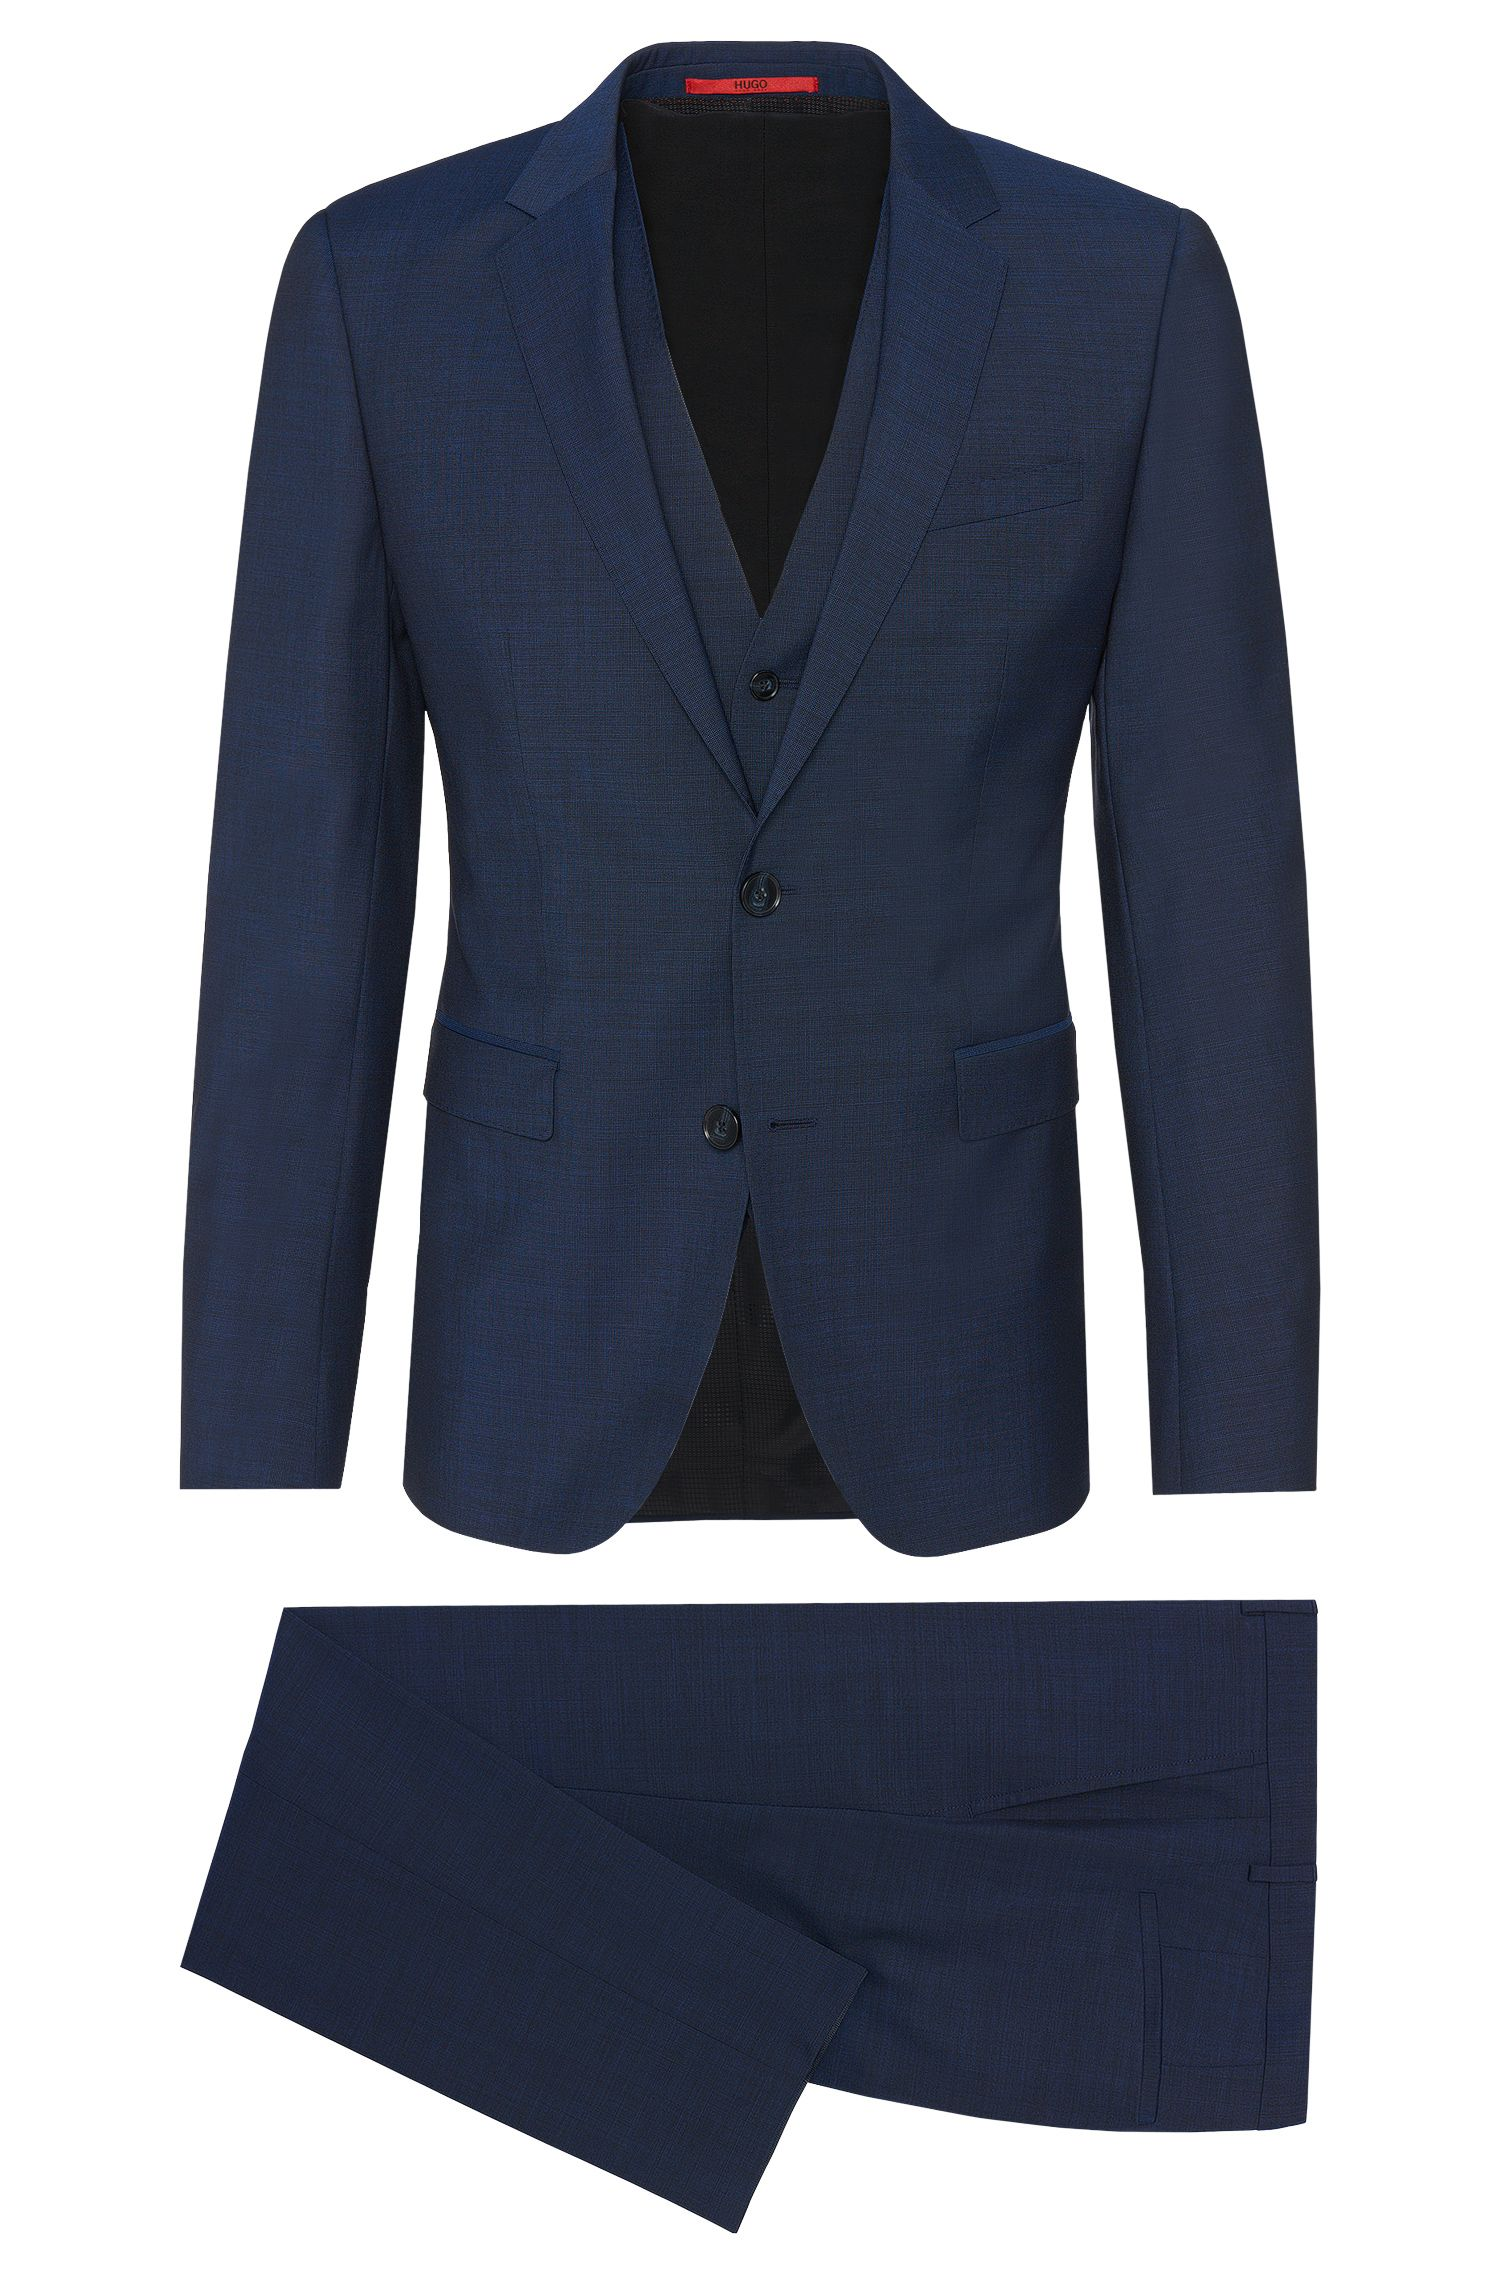 'Adwart/Wilard/Hets' | Slim Fit, Italian Super 100 Virgin Wool 3-Piece Suit